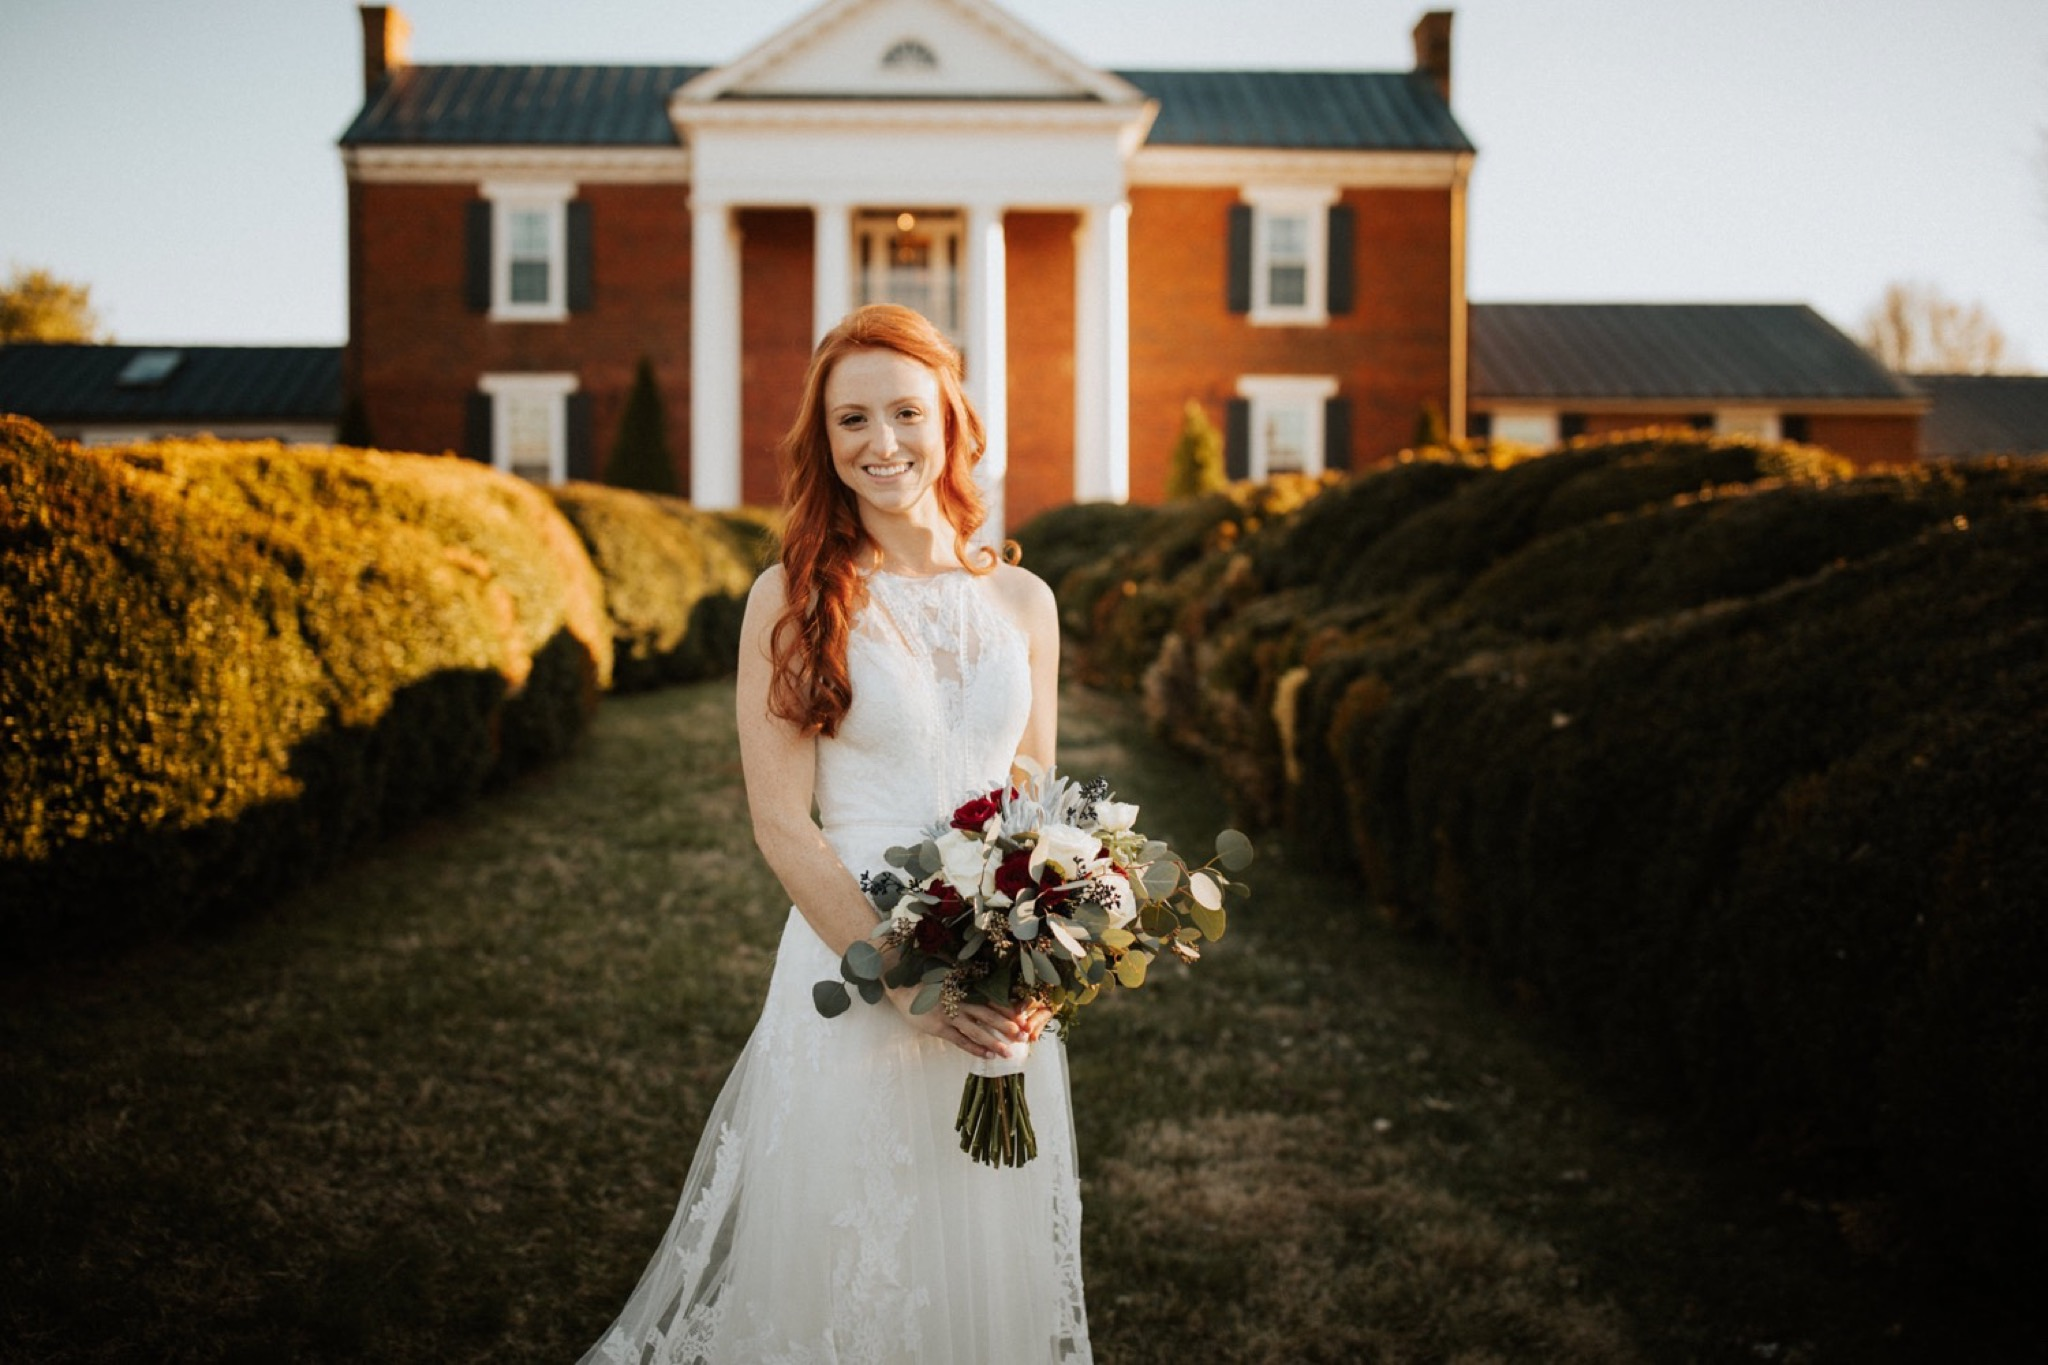 72_West Manor Estate Weddings - Pat Cori Photography-152_bride_VirginiaWeddingPhotographer_WestManorEstate_Portraits_Wedding.jpg